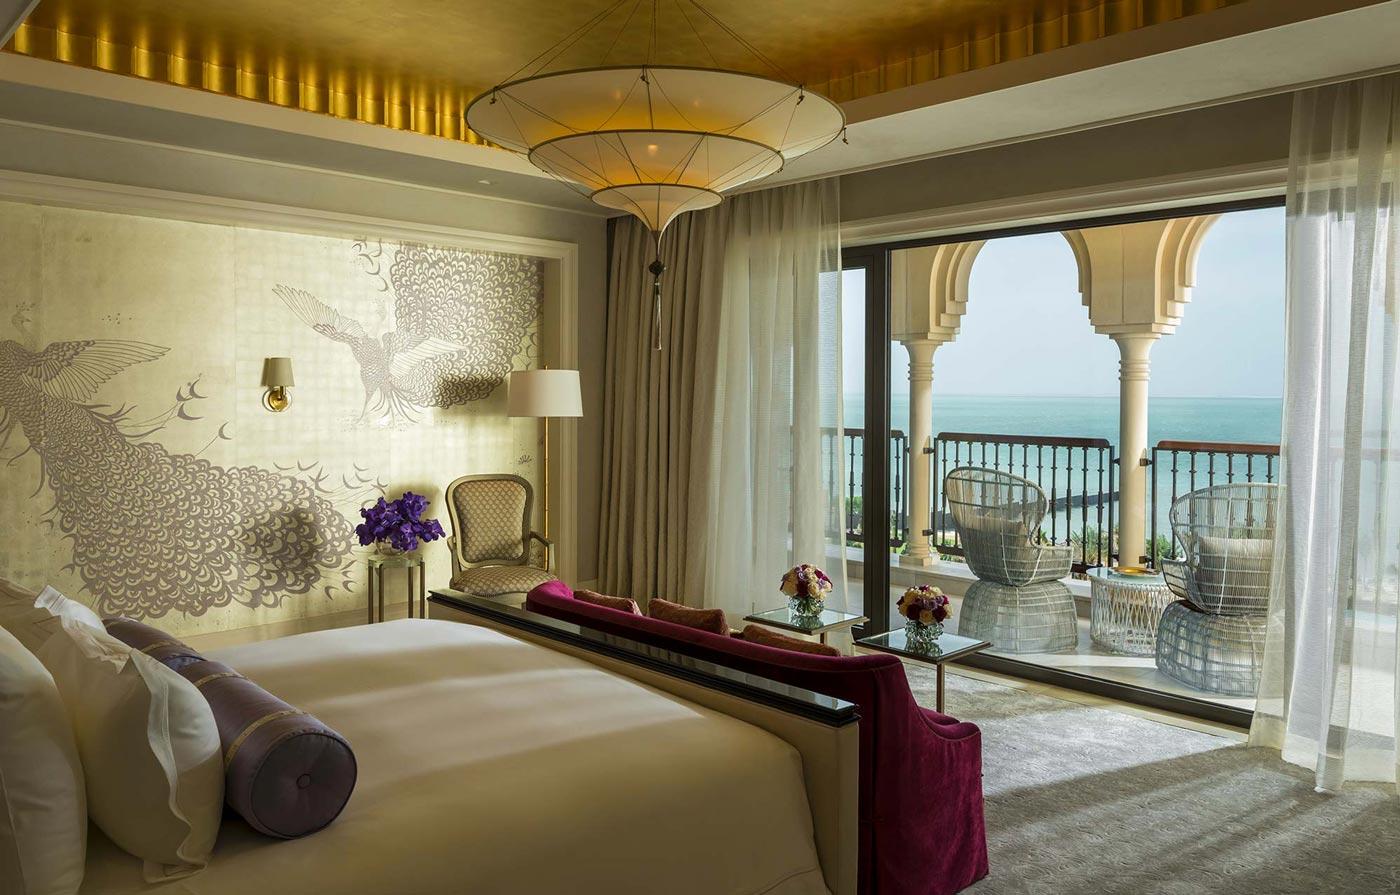 3 tiers plain silk lamp Scheherazade in Four Seasons Resort Hotel in Dubai, Royal Suite Master bedroom